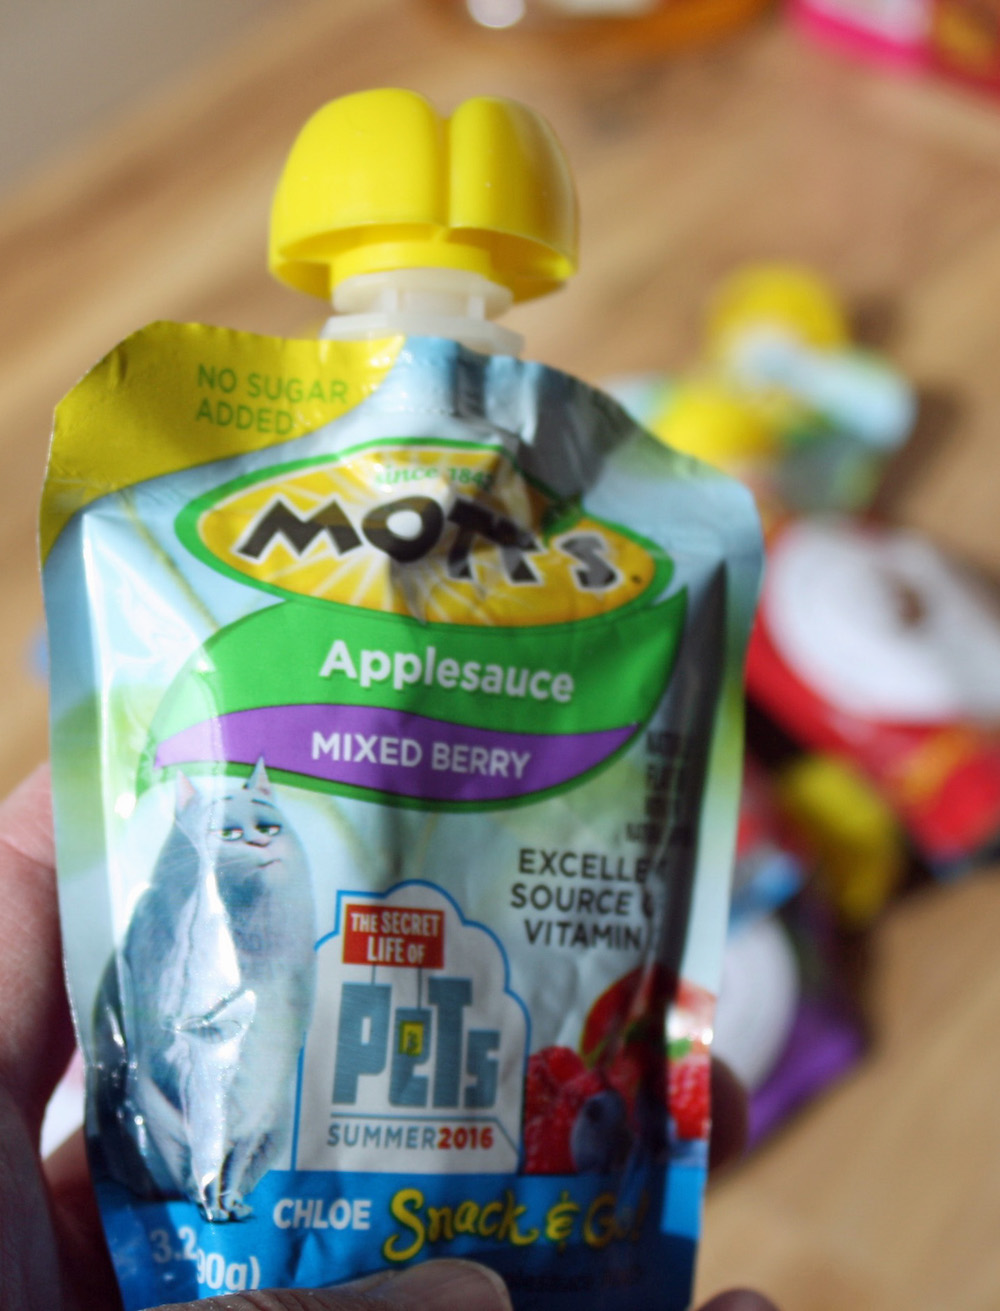 The Secret Life of Pets Motts Apple Sauce Packaging